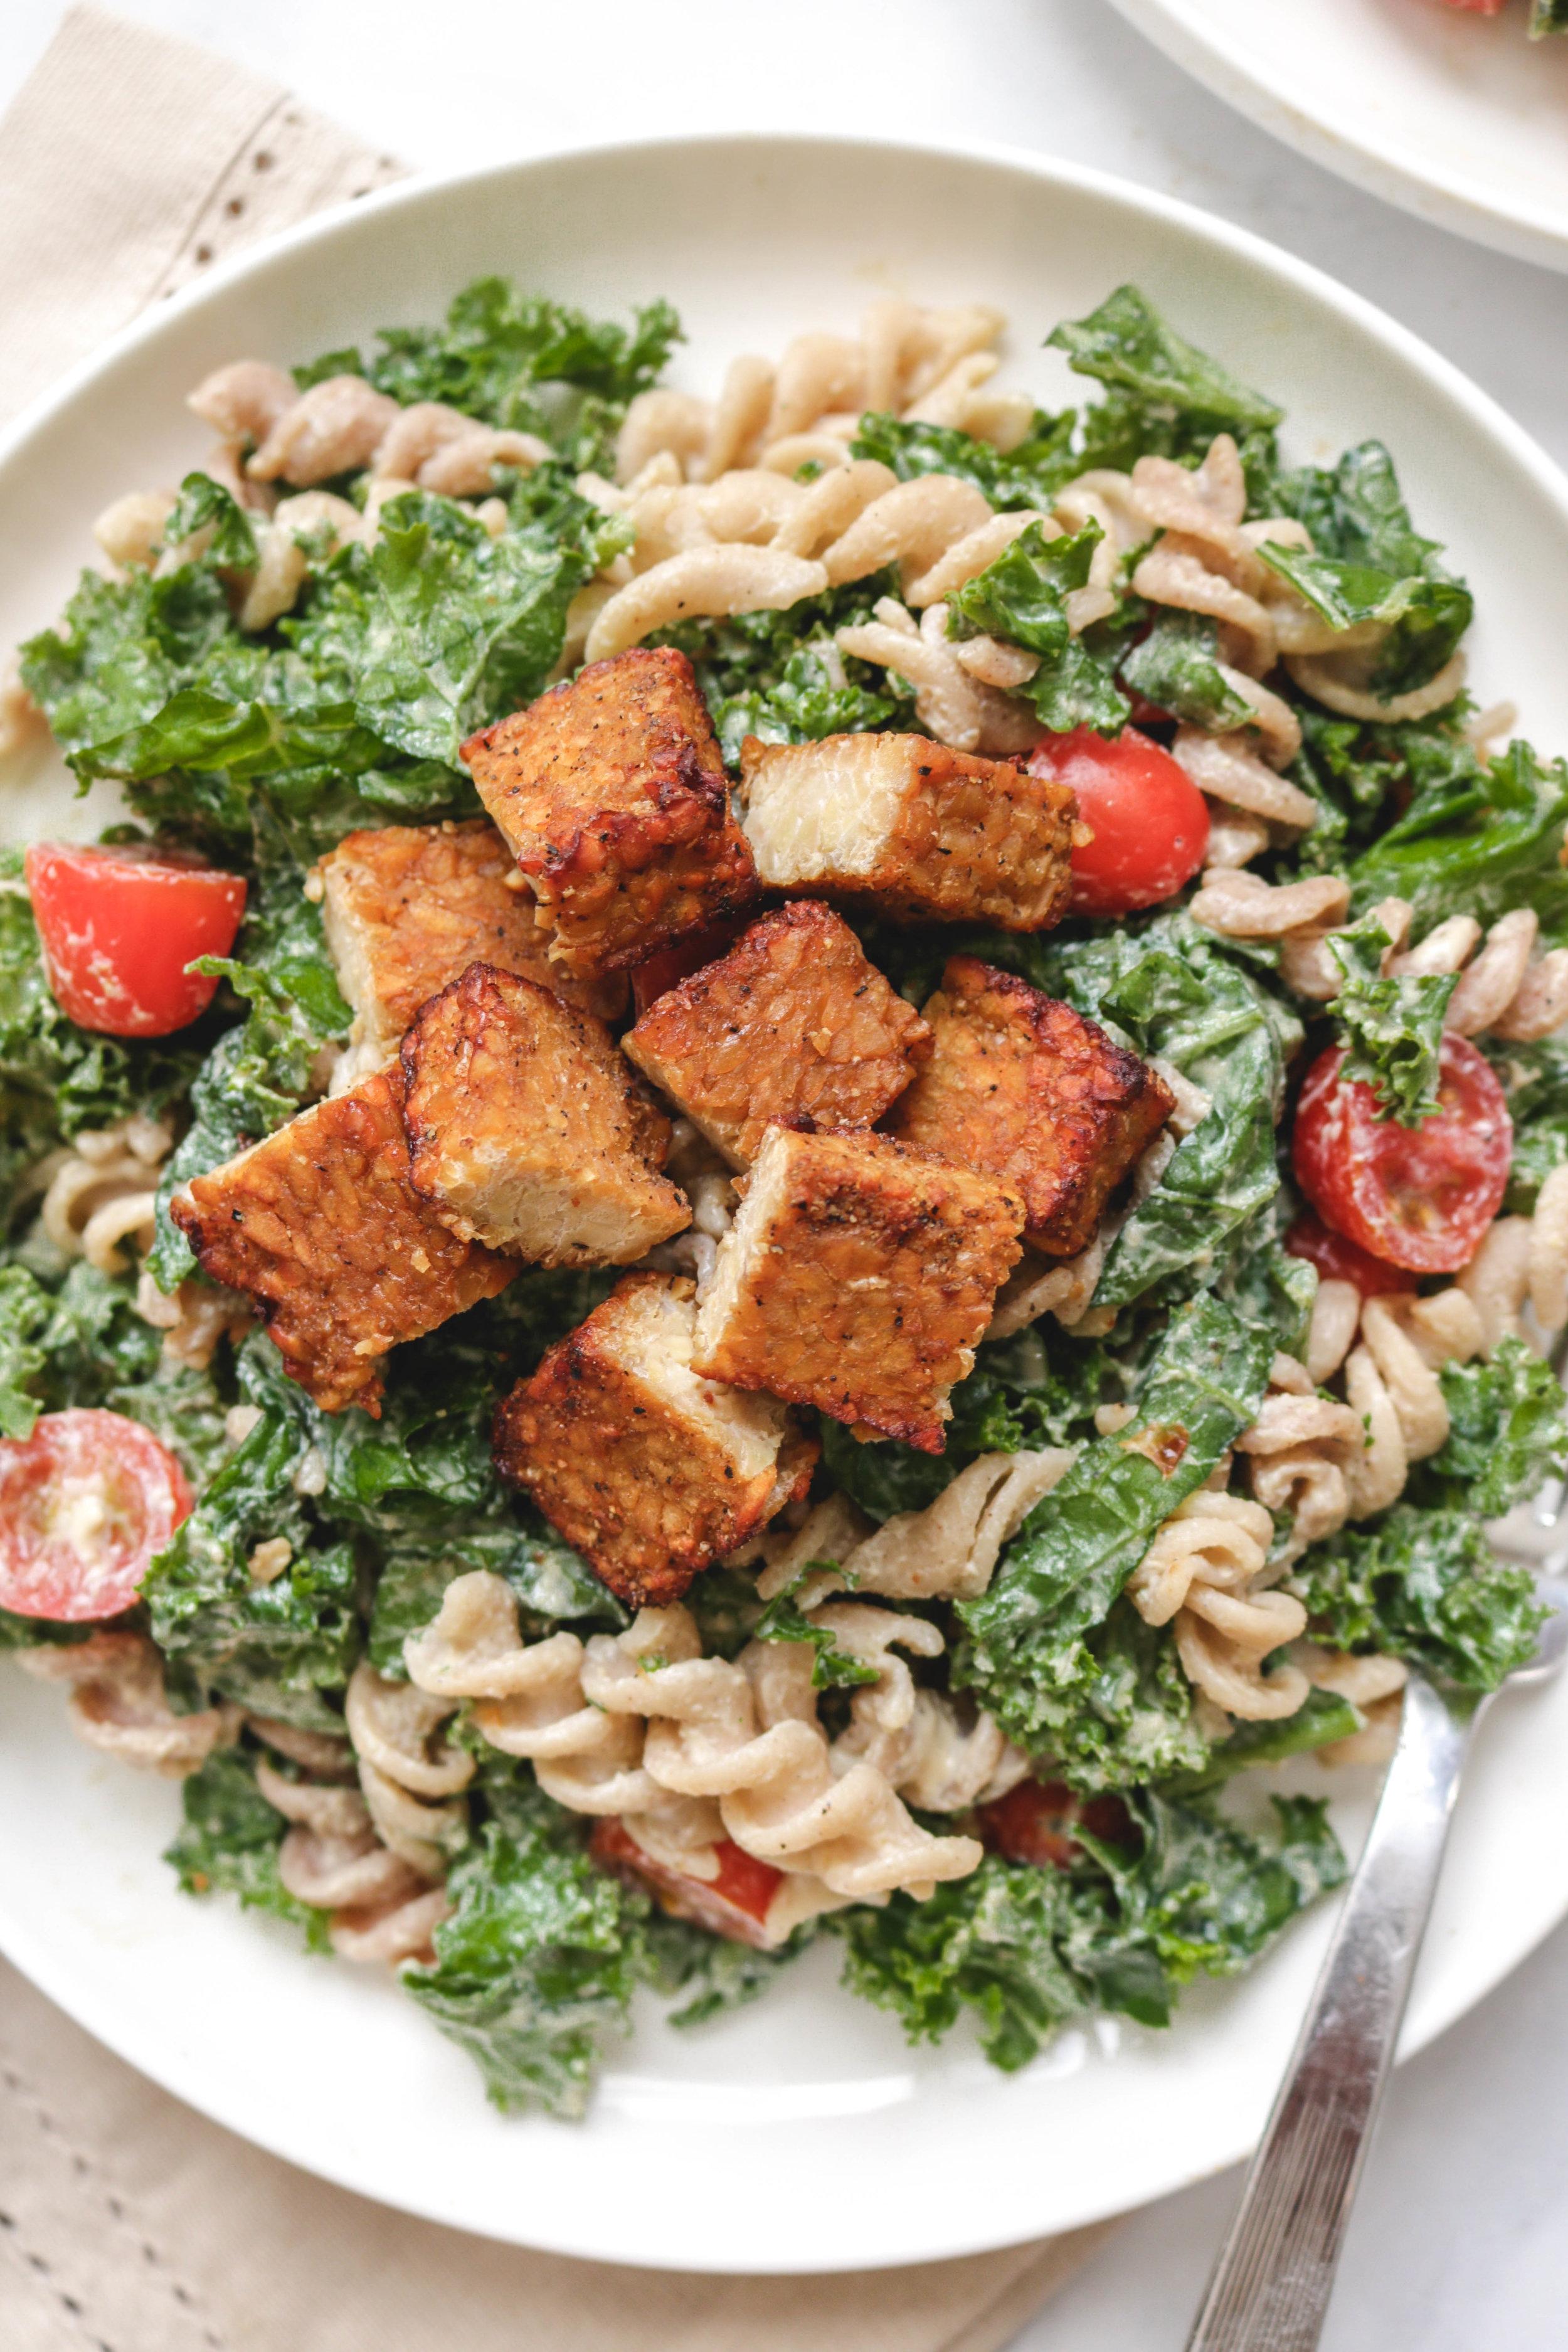 vegan caesar dressing kale salad on white plate close up